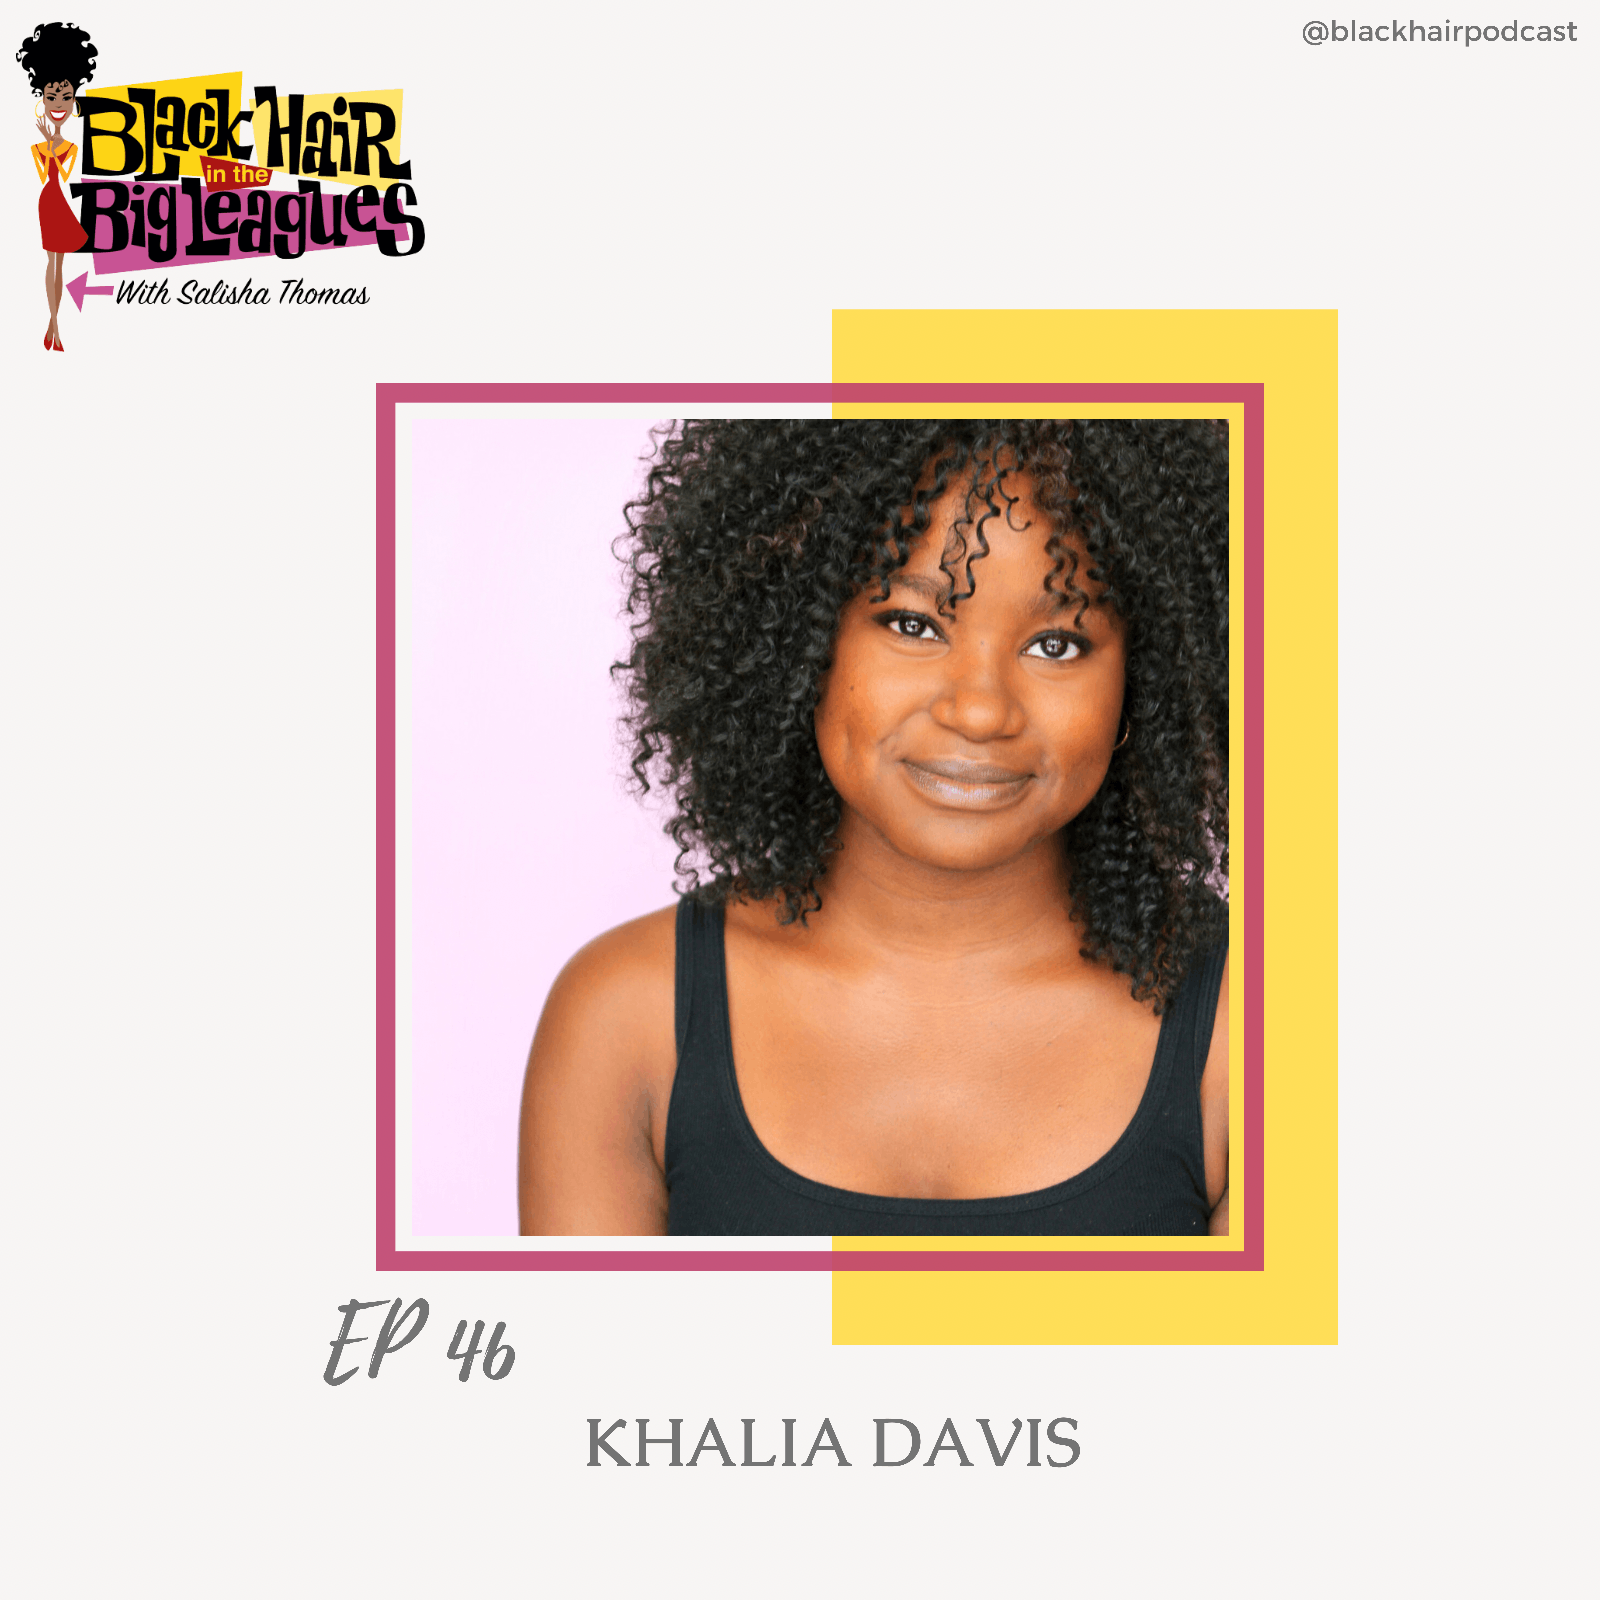 EP 46- Khalia Davis talks Black Hair and Taking Action